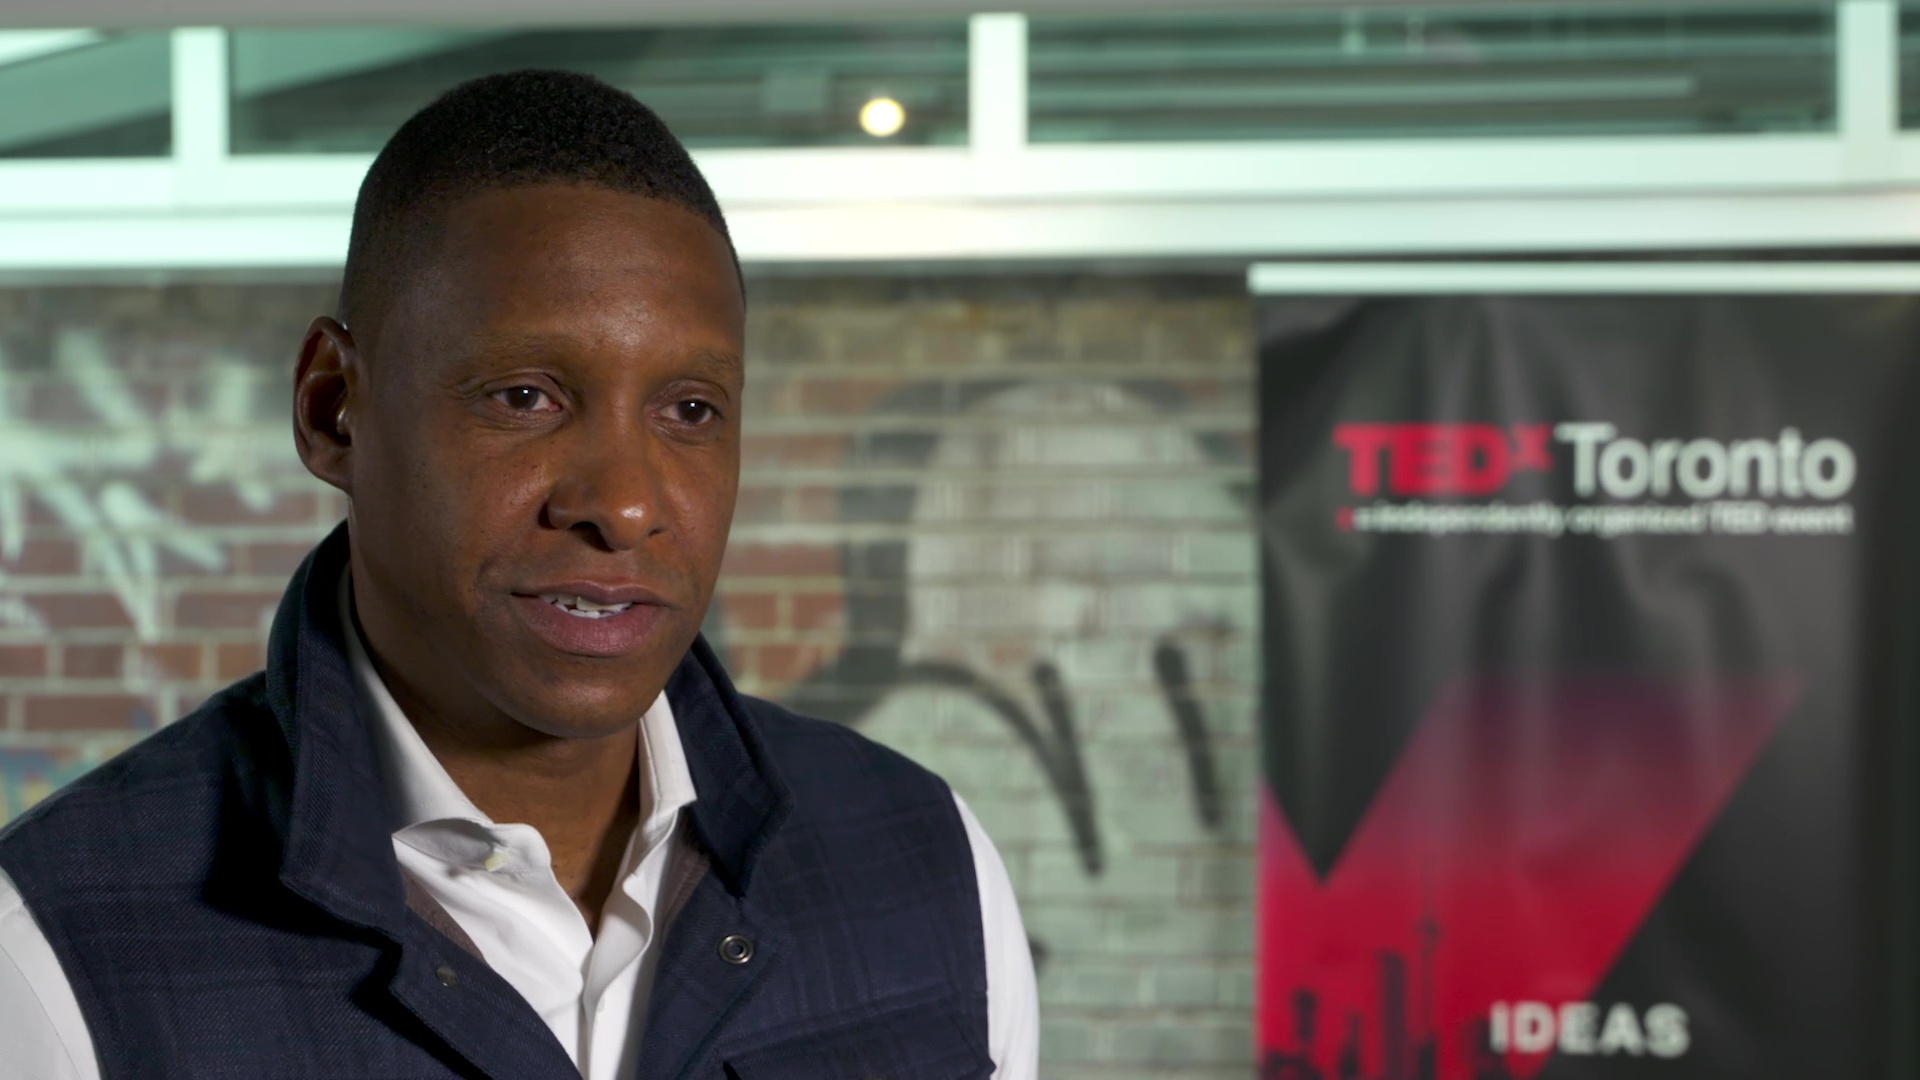 LiVECAST.ca - Masai Ujiri at TEDx Toronto 2018